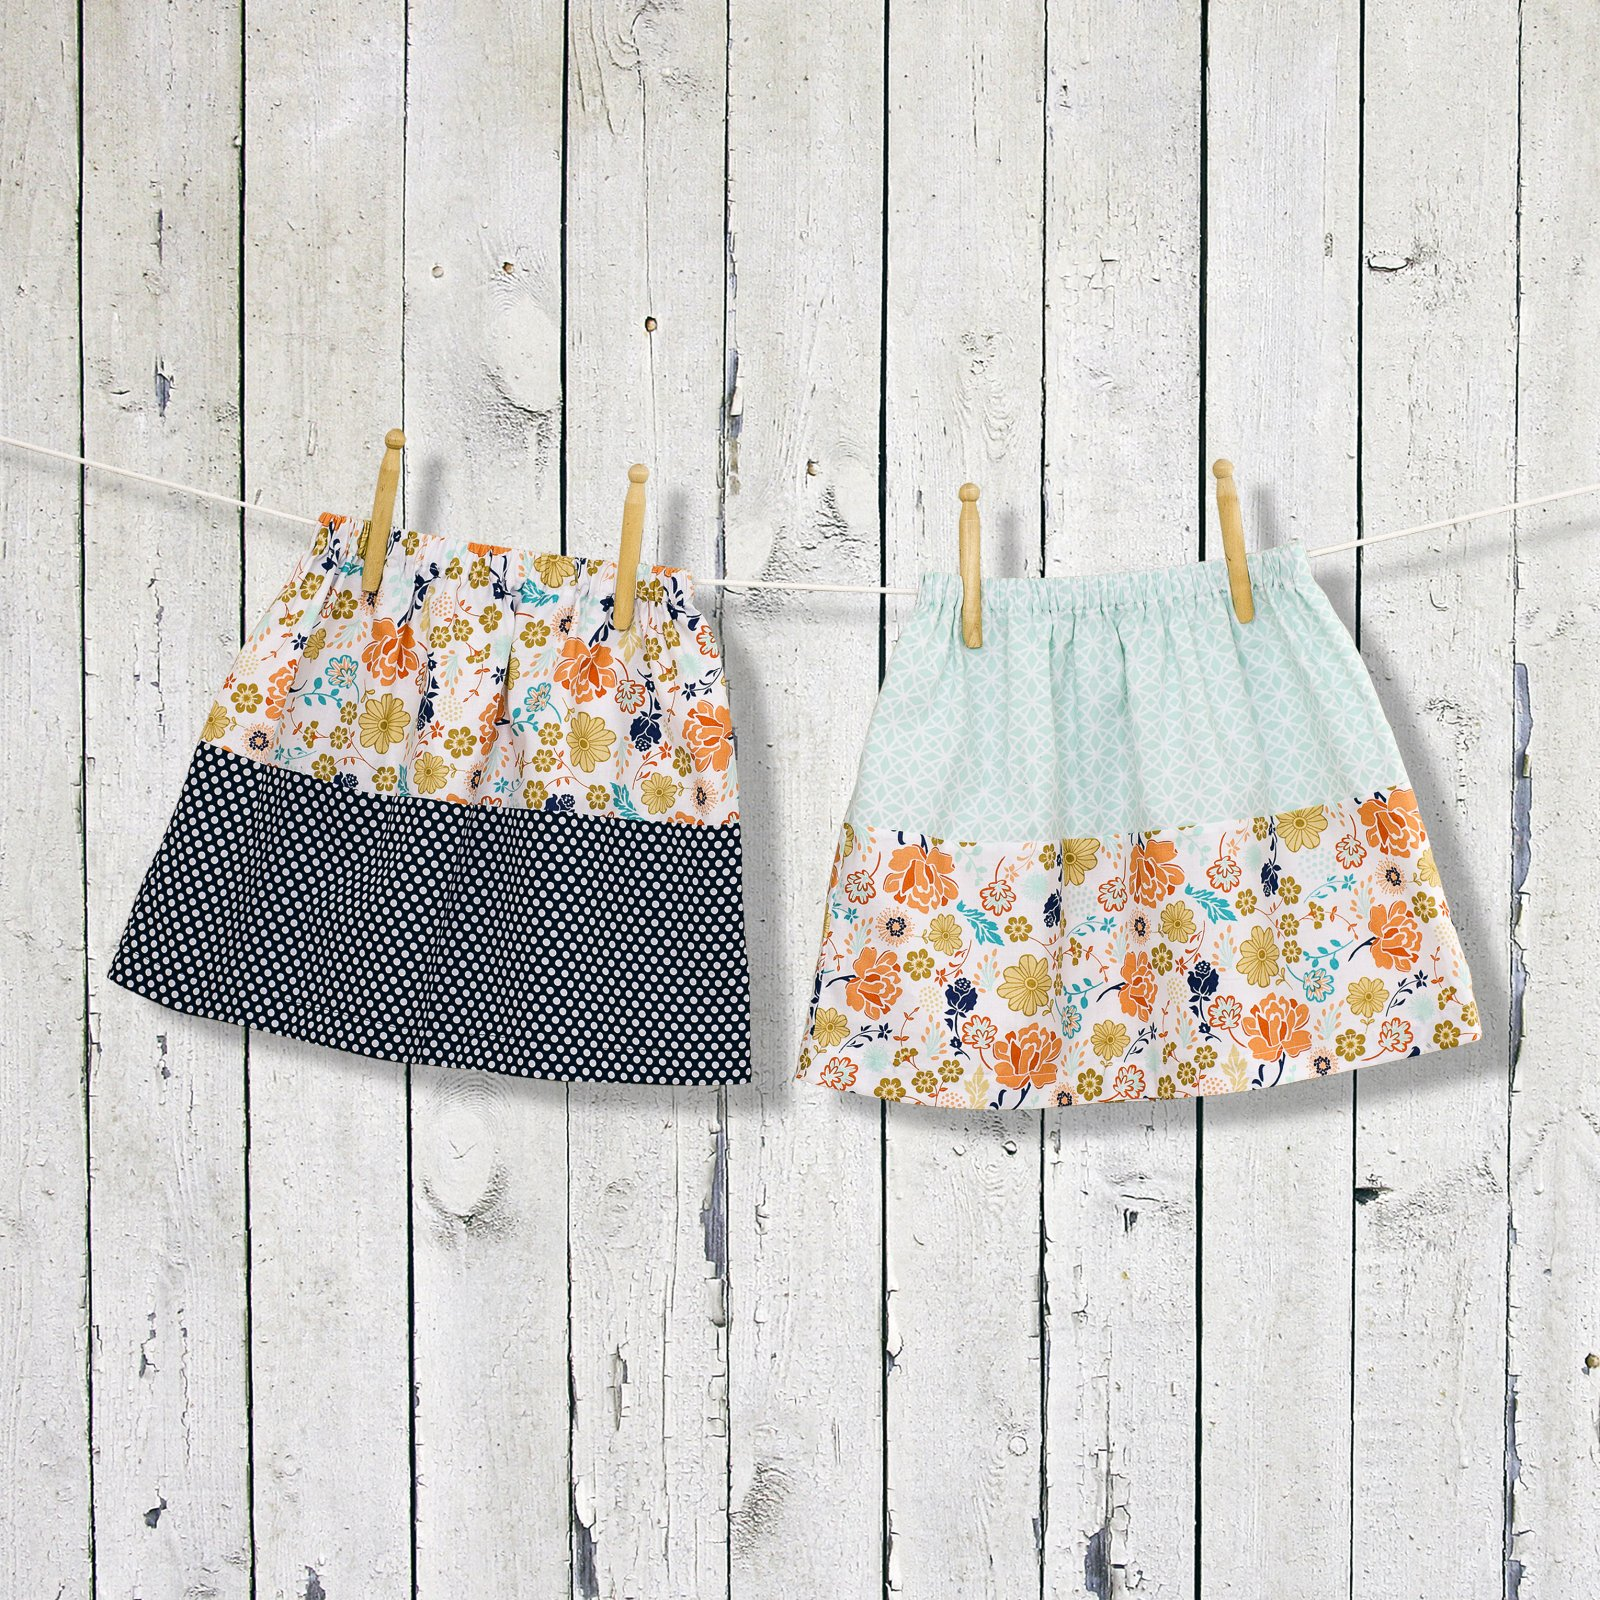 Sew Simple Skirt